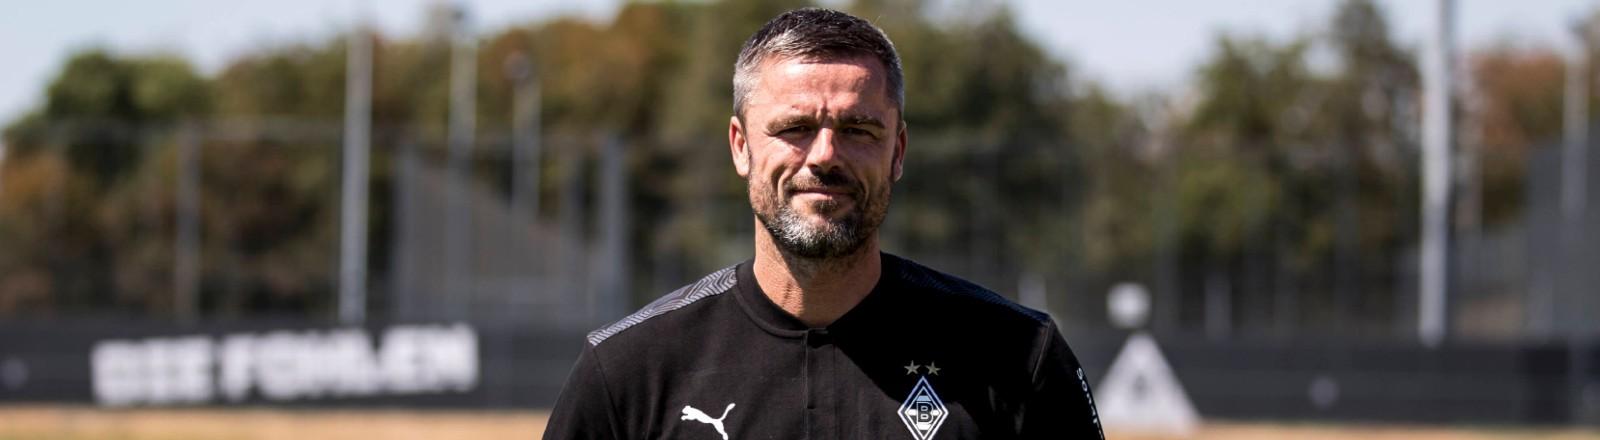 Martin Meichelbeck, Borussia Mönchengladbach